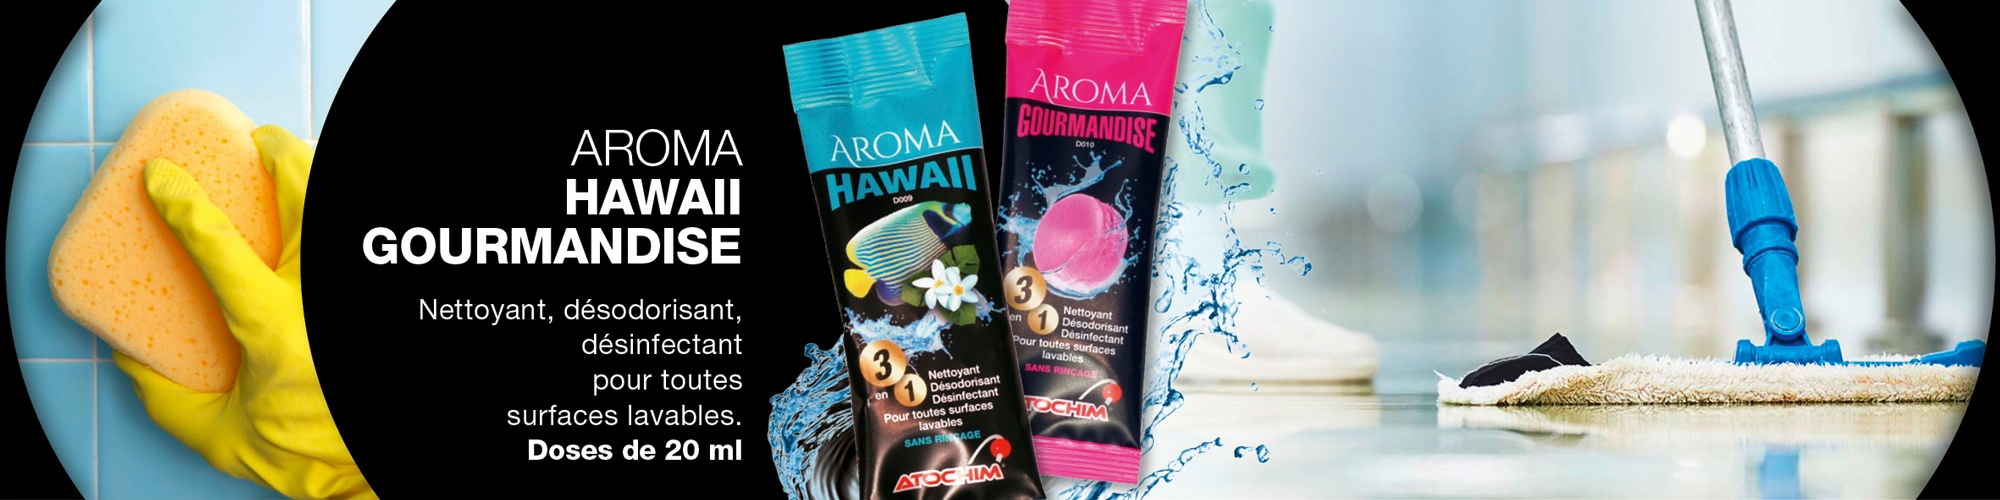 AROMA DOSES HAWAII GOURMANDISE